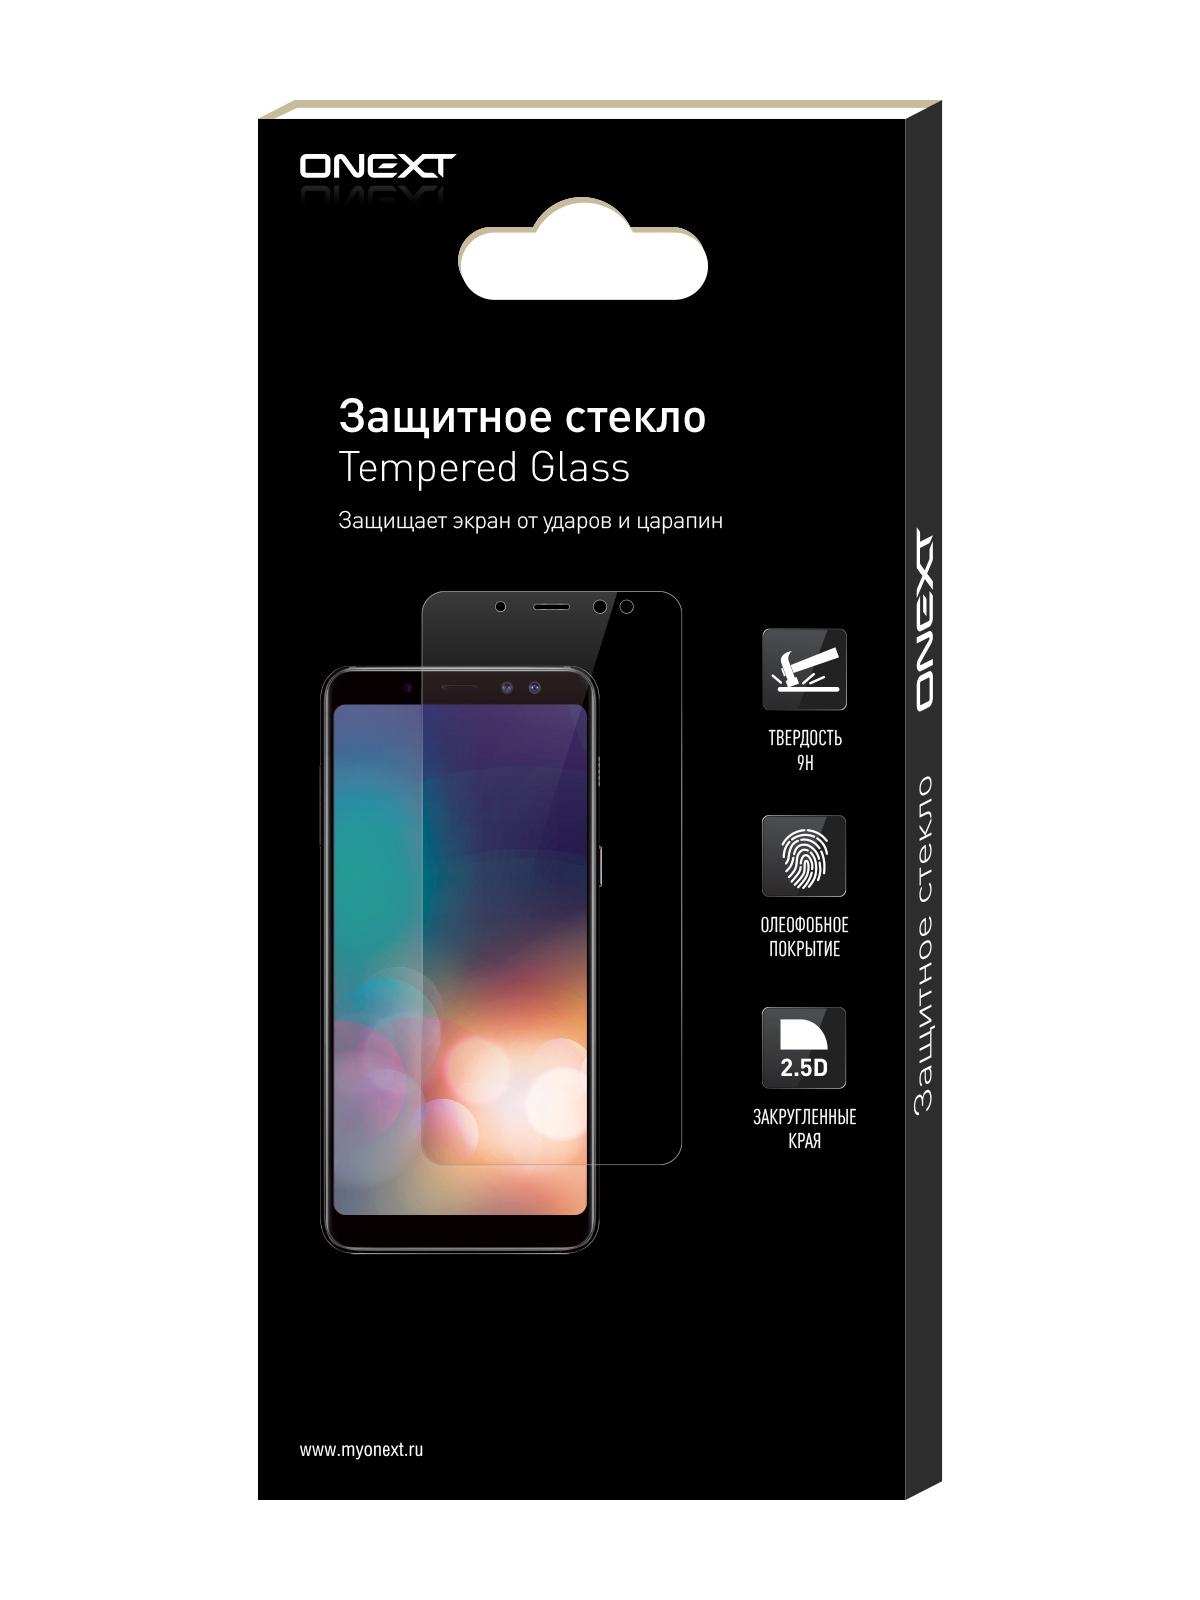 Защитное стекло ONEXT Sony Xperia Z3+/Z3+ Dual аксессуар защитное стекло sony xperia z3 z3 dual onext 40946